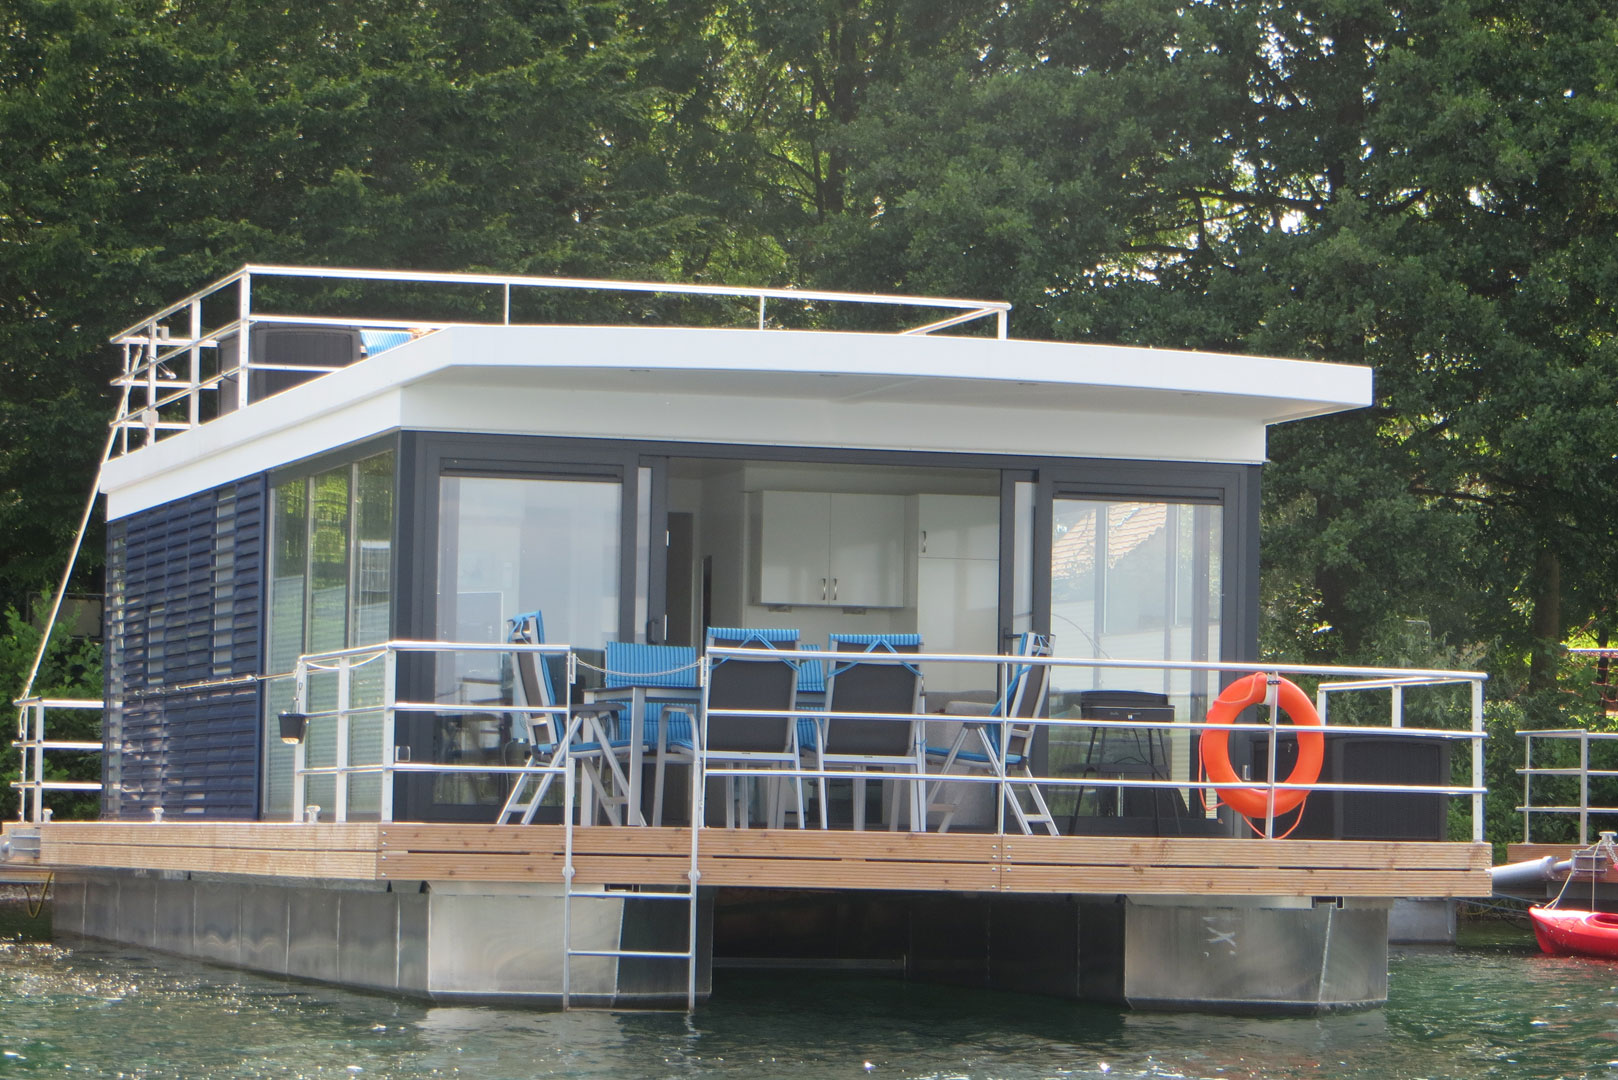 Hausboot mieten Hausbootferien Urlaub am See